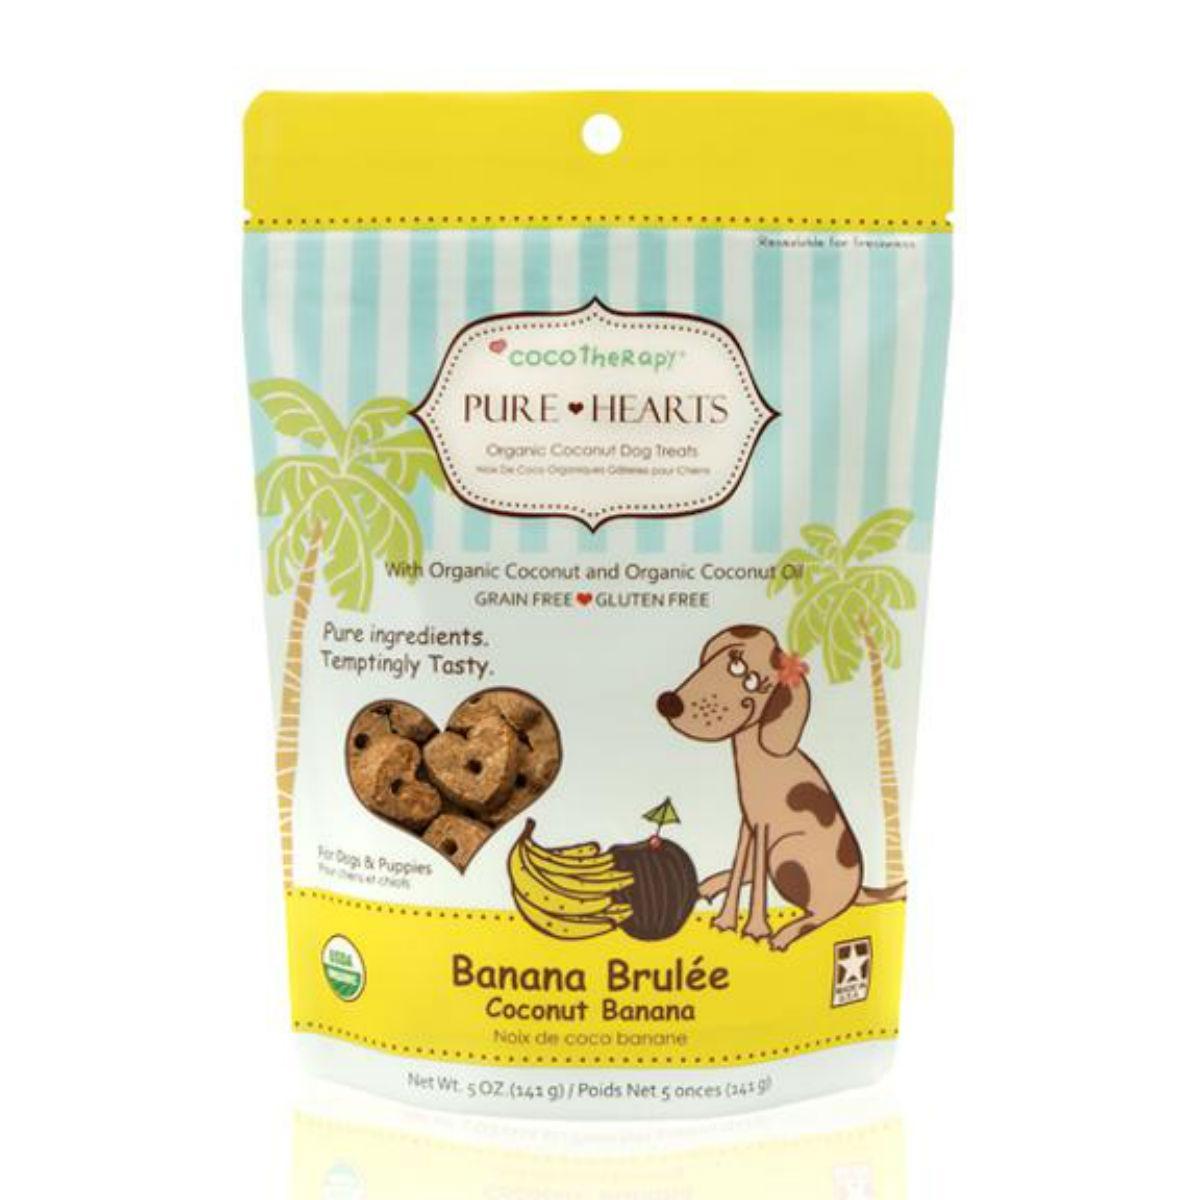 CocoTherapy Pure Hearts Organic Dog Treats - Coconut Banana Brulee